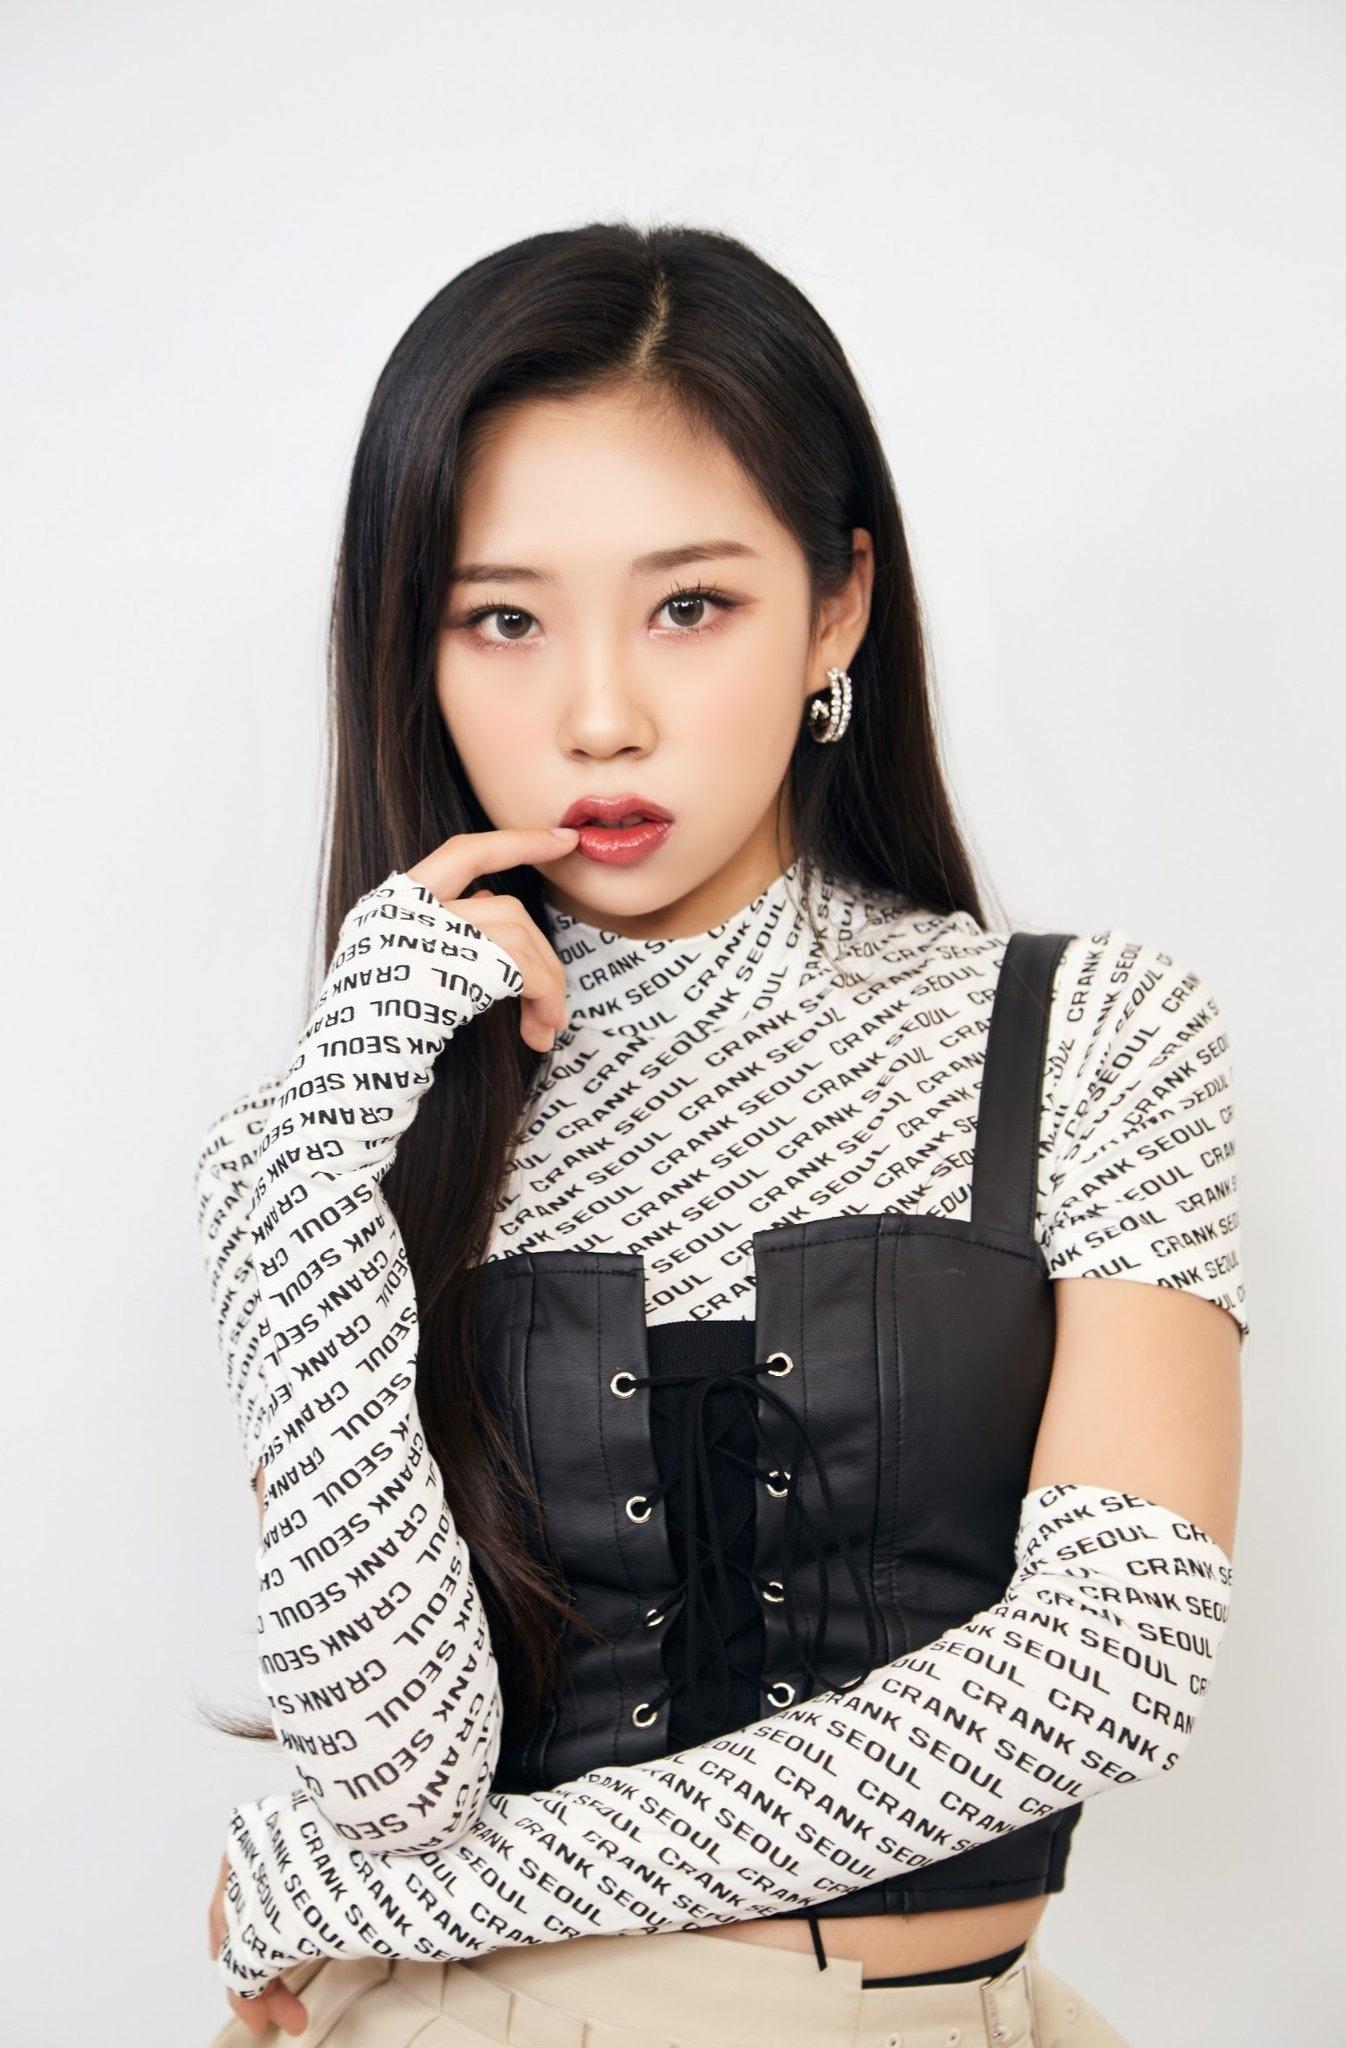 Eunseong